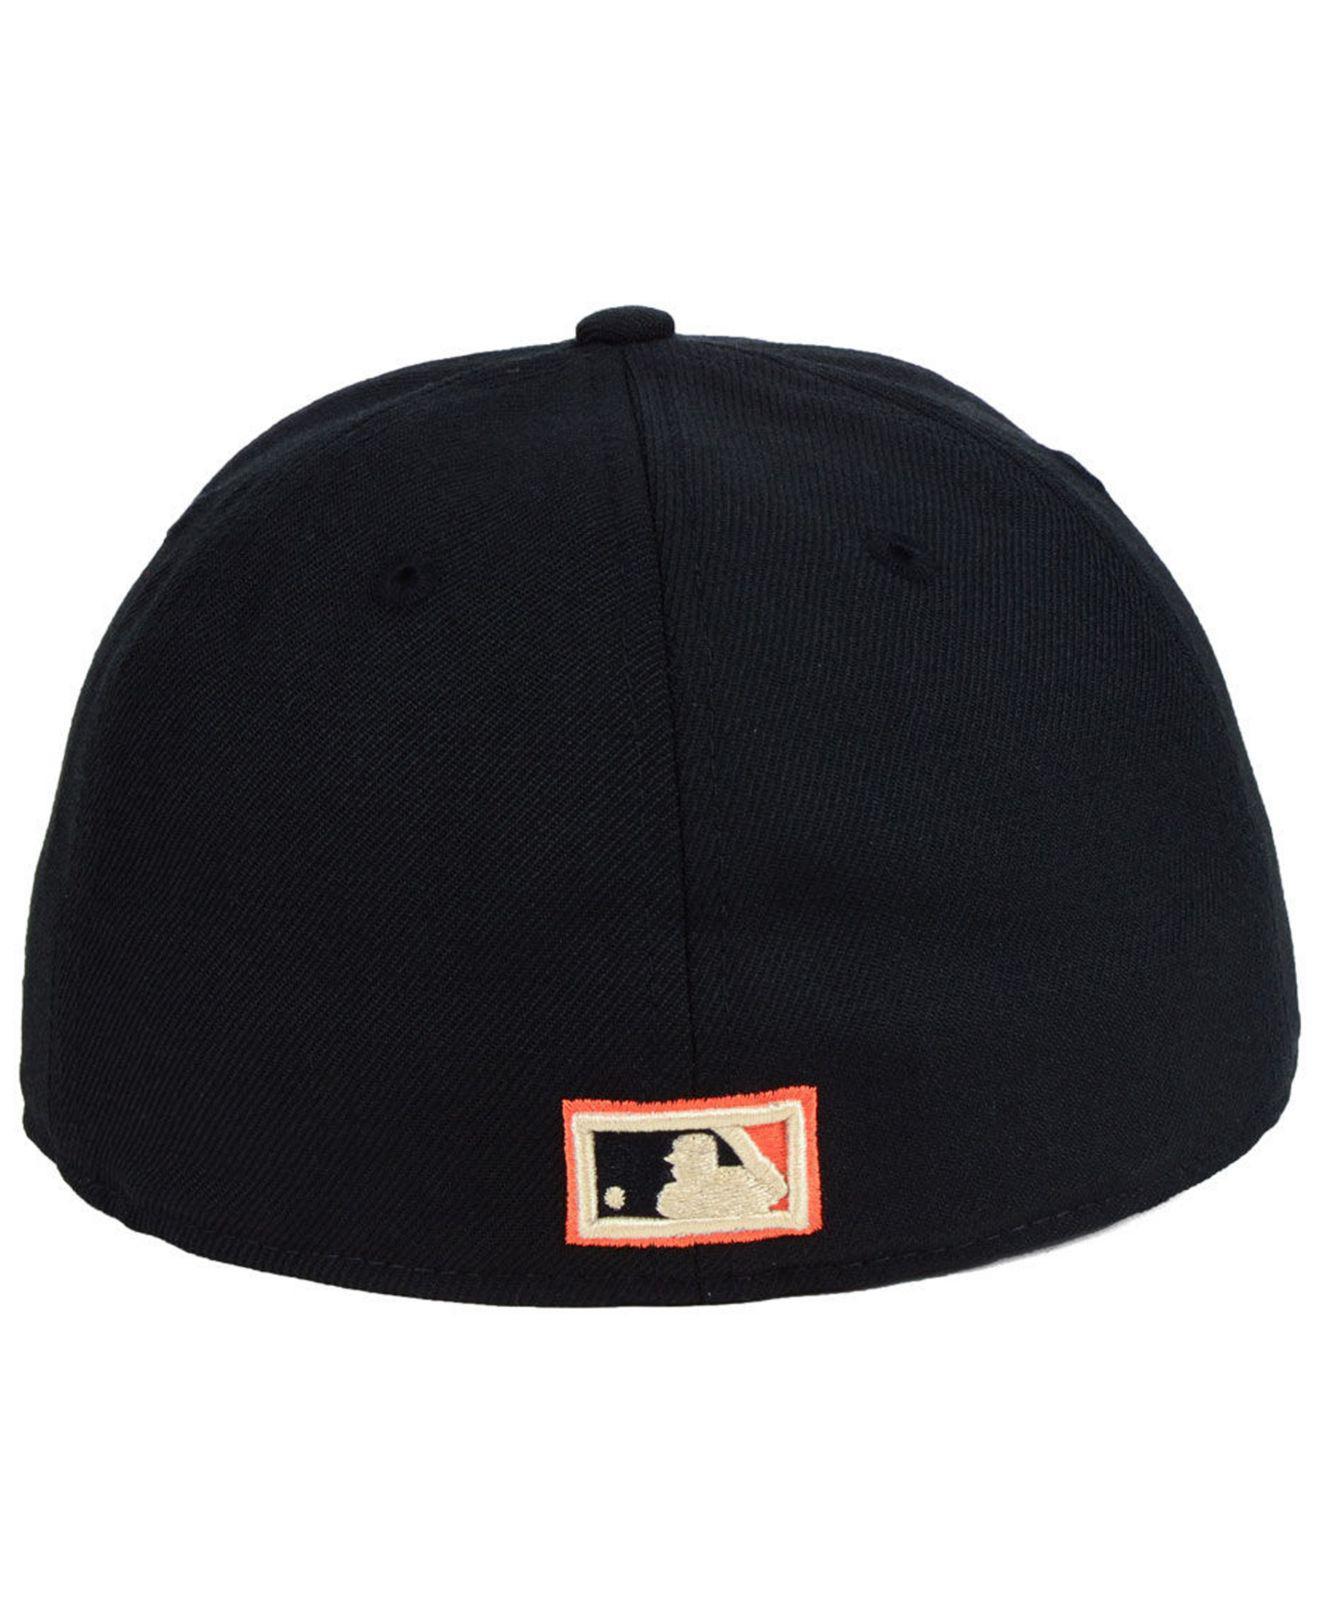 size 40 02e7f e313e ... cheap gallery. previously sold at macys mens baseball caps mens bucket hats  mens new era